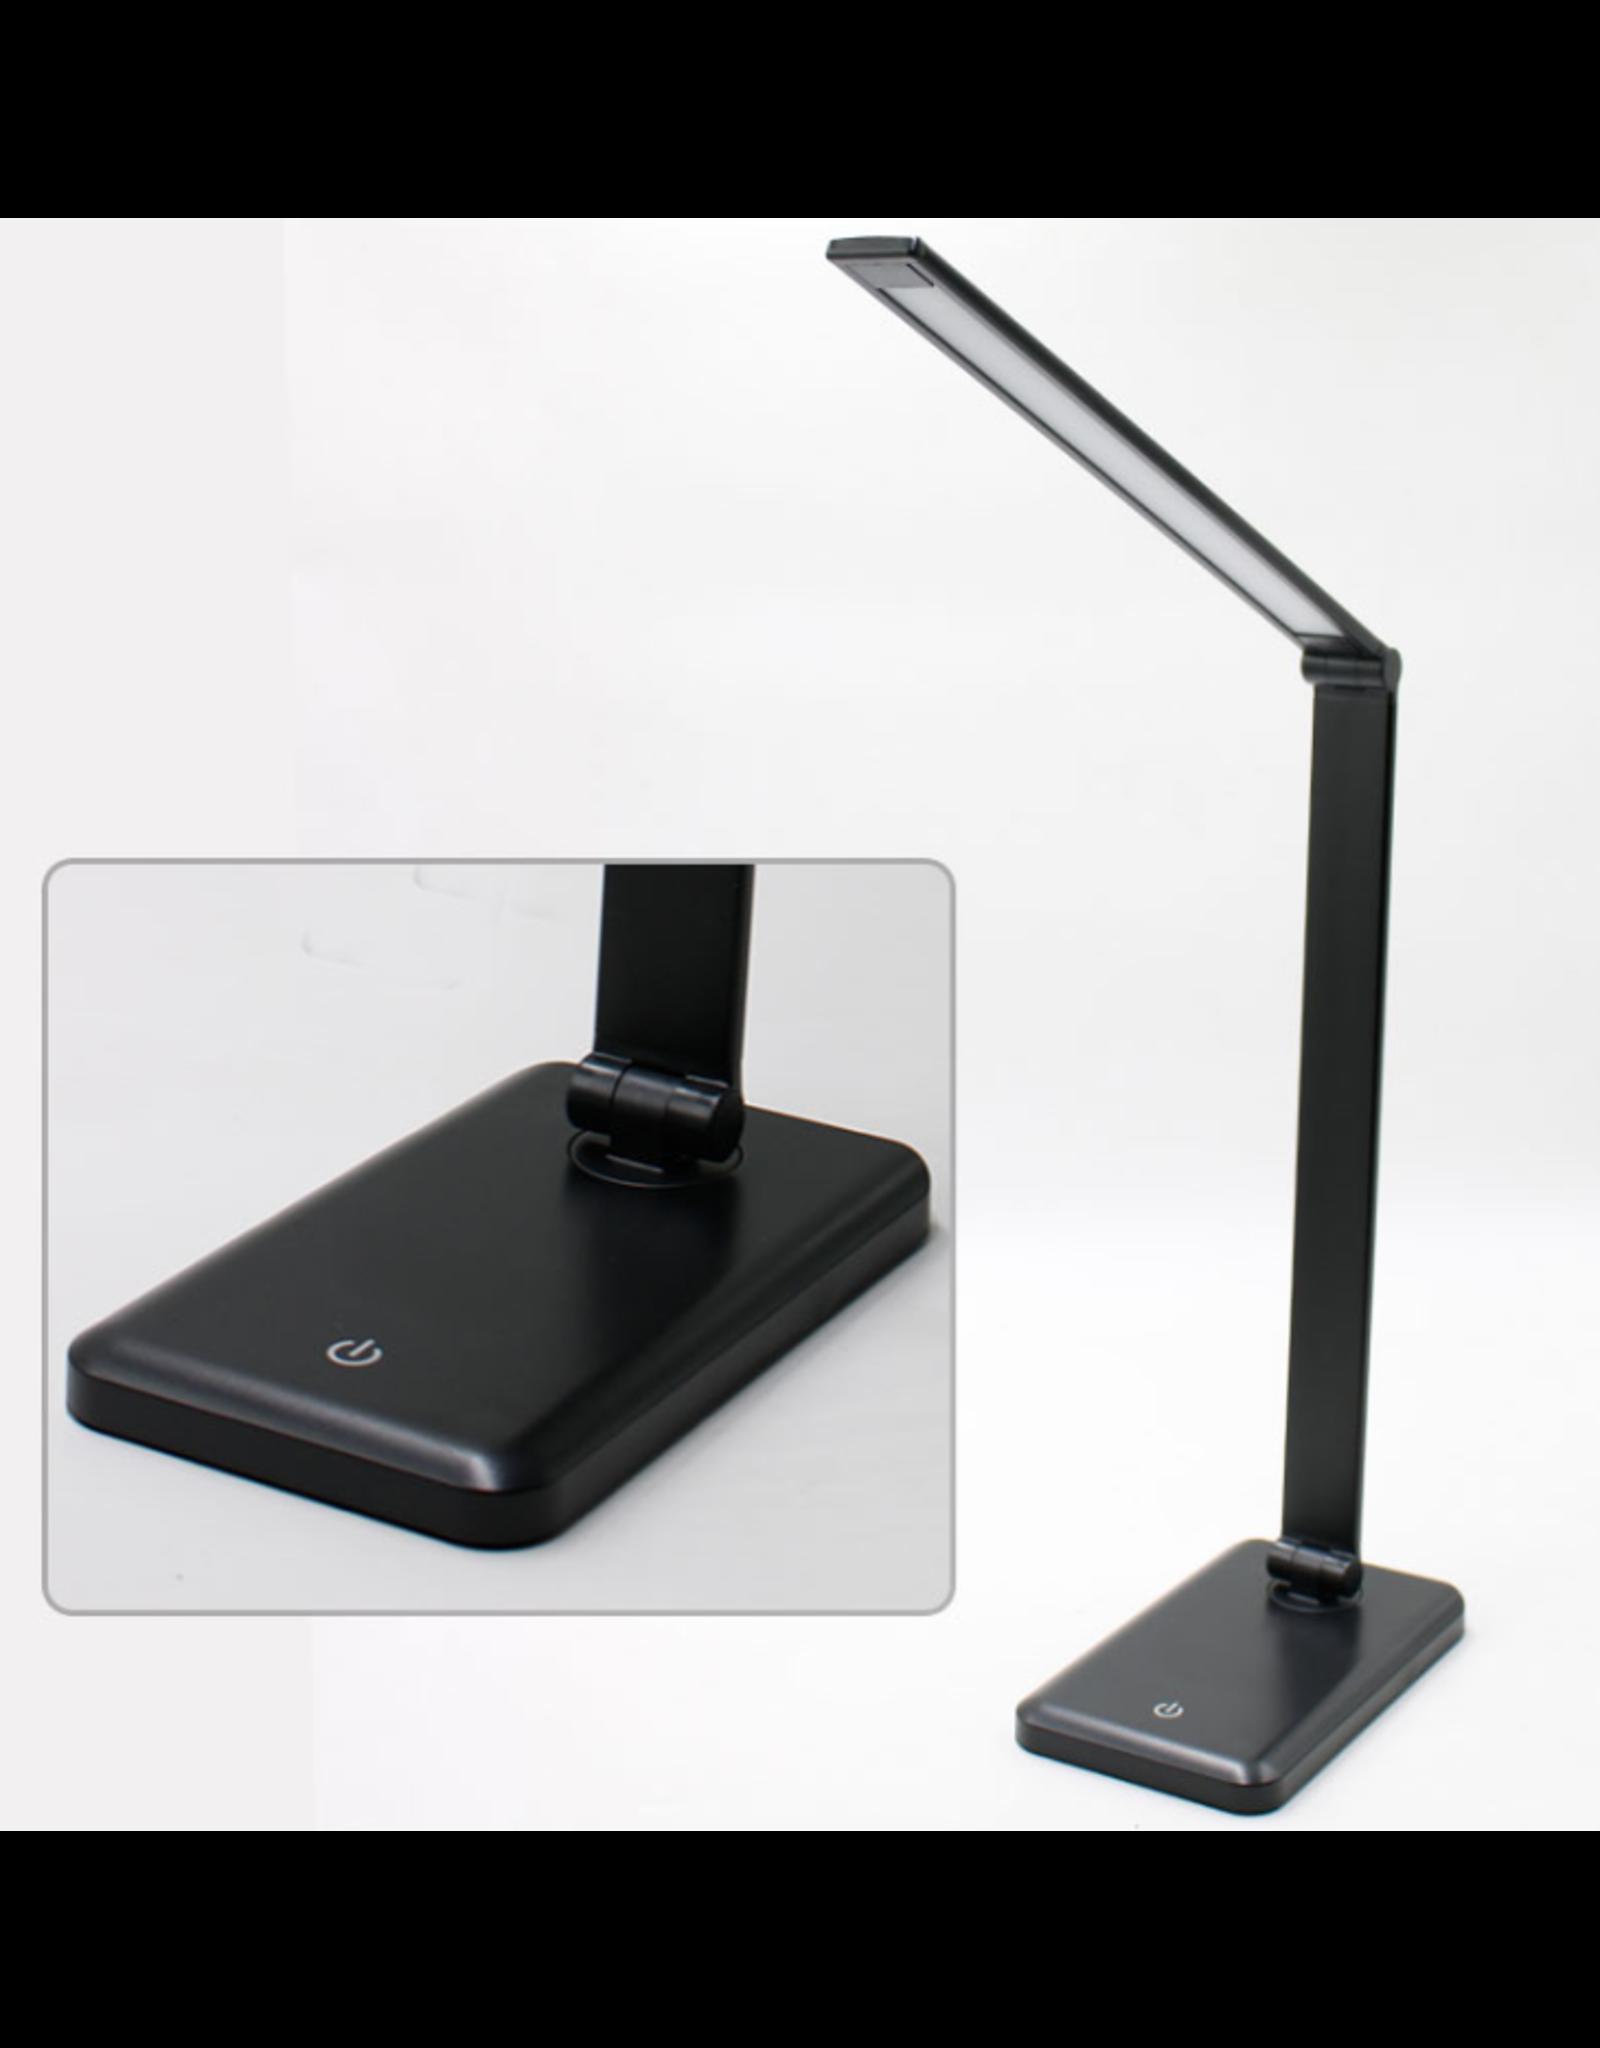 Parya Official Parya Official - LED Bureaulamp - Draadloos Opladen Voor Telefoon - Zwart